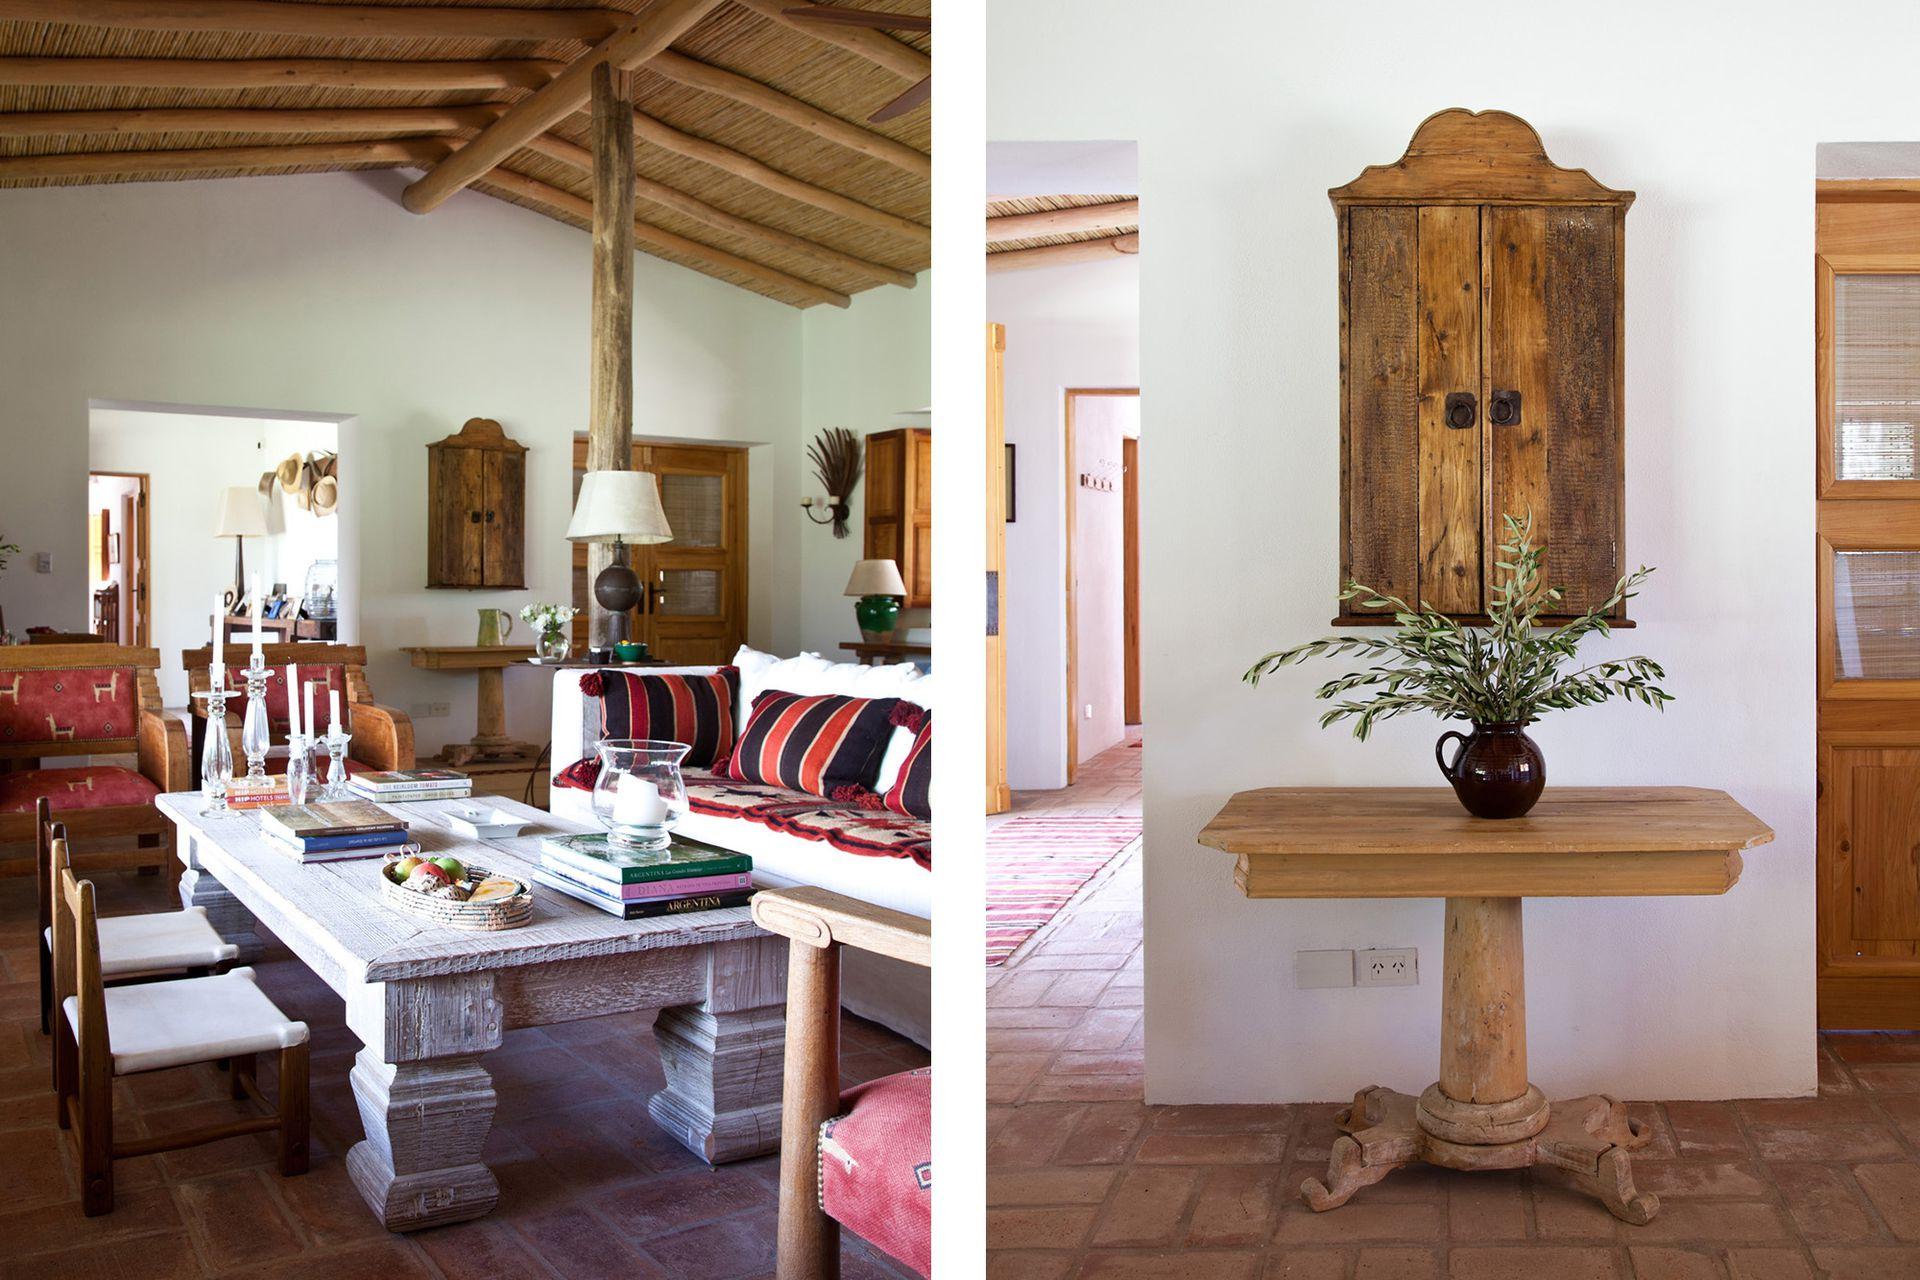 Este pintoresco mueble tipo retablo (Alberto Ledesma) se usa para guardar copas. Abajo, mesa tipo Biedermeier en madera rústica encontrada en un corralón de San Juan.